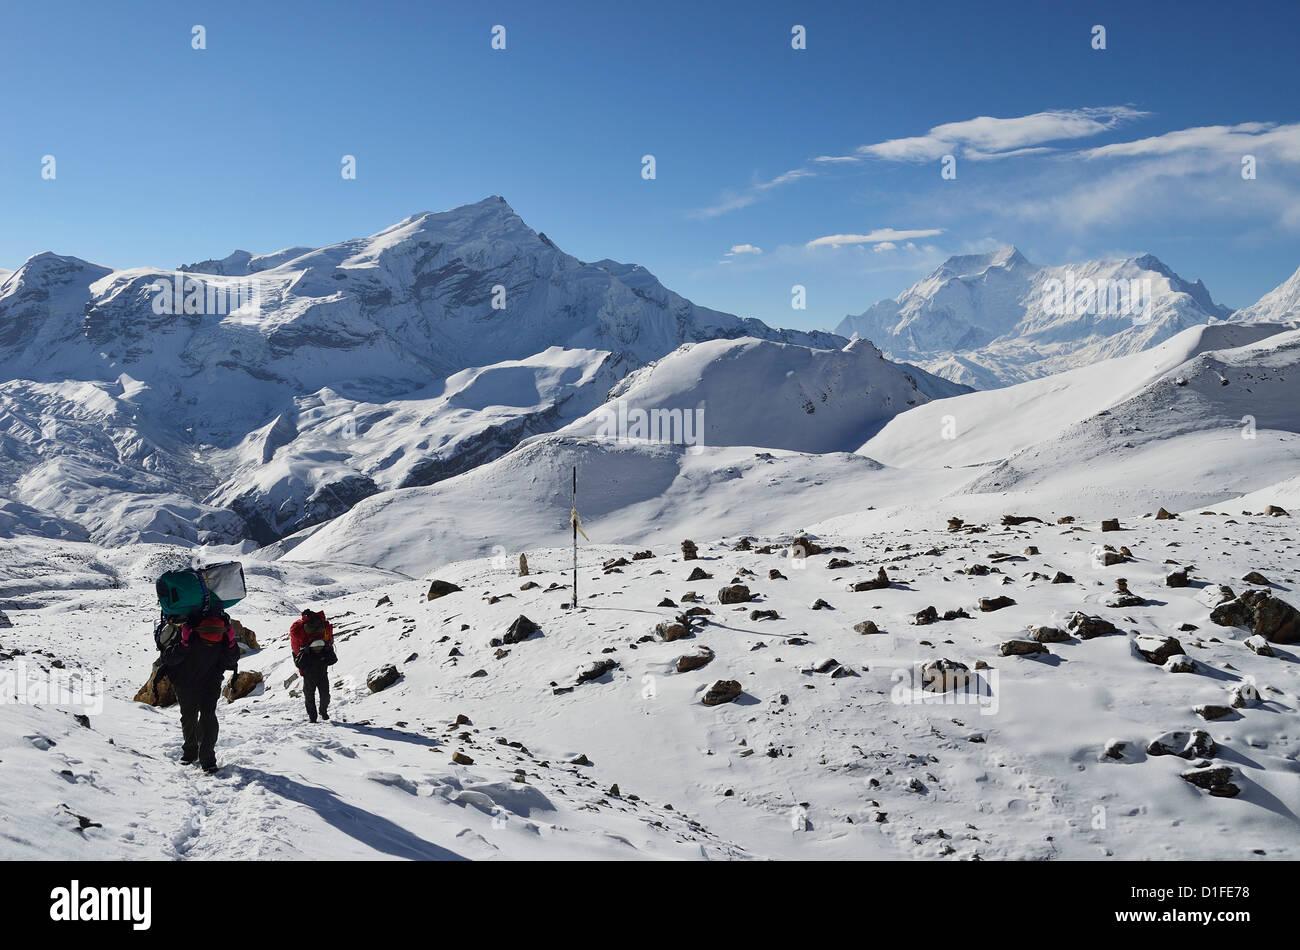 Thorong La (Thorung La), a pass at 5416m, Annapurna Conservation Area, Gandaki, Western Region (Pashchimanchal), - Stock Image